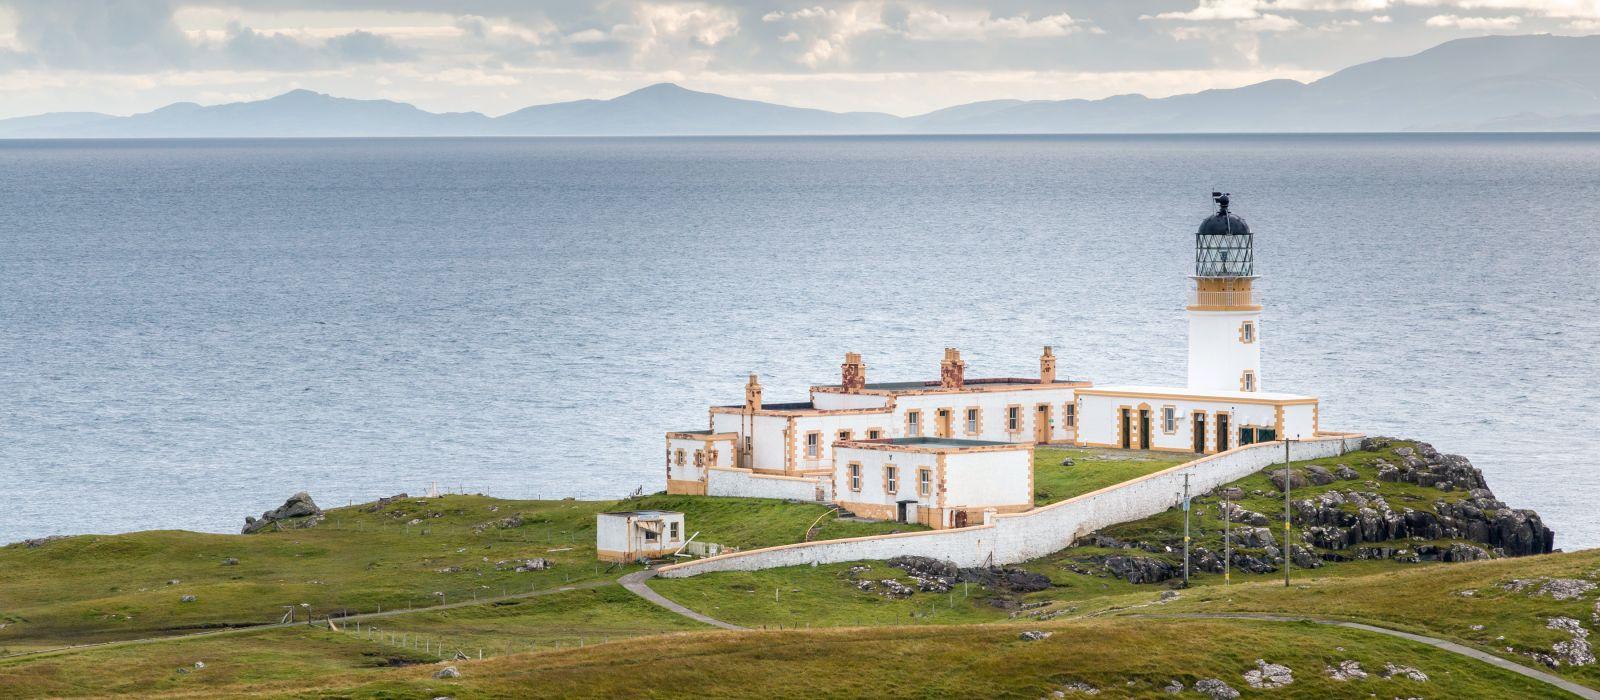 Lighthouse on the cliffs of Neist Point, a famous landmark near Glendale, Isle of Skye, Scotland, Europe